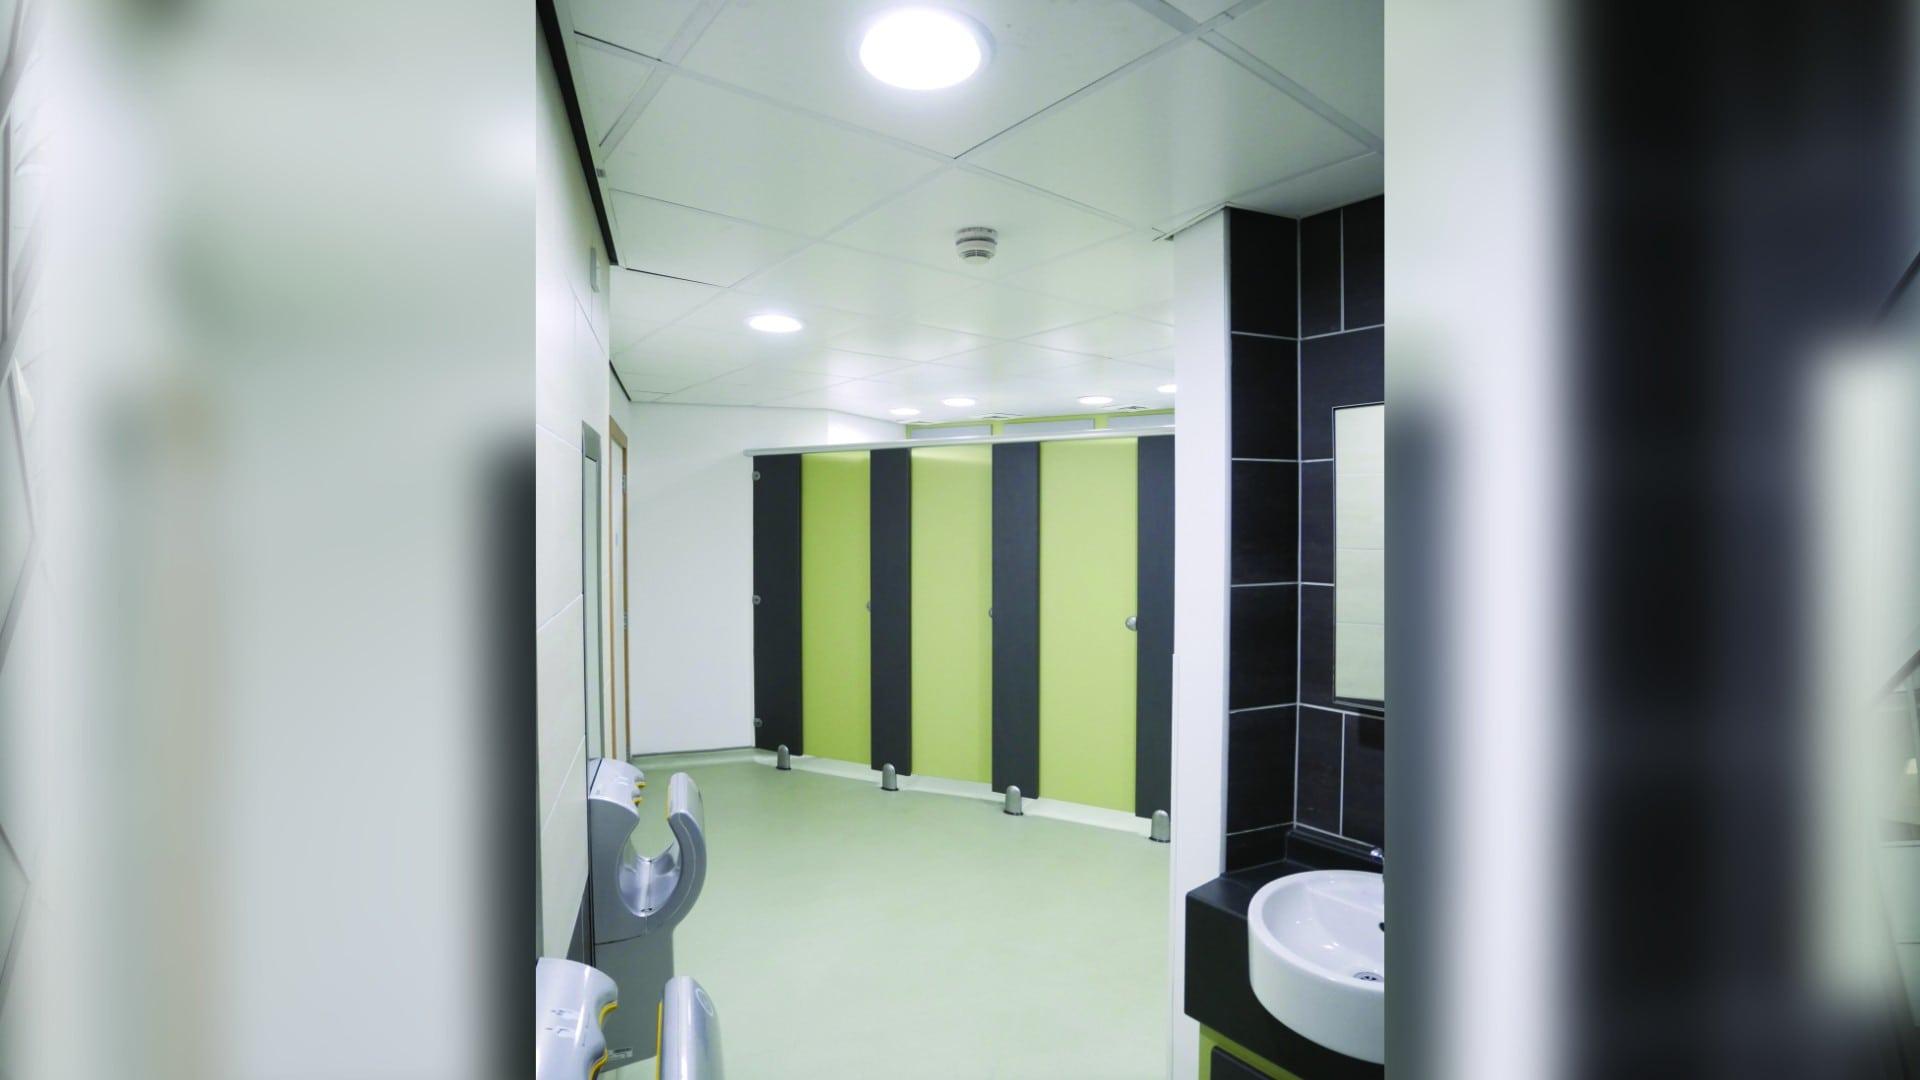 Northumbria CCE1 - ZIP LED Bathroom